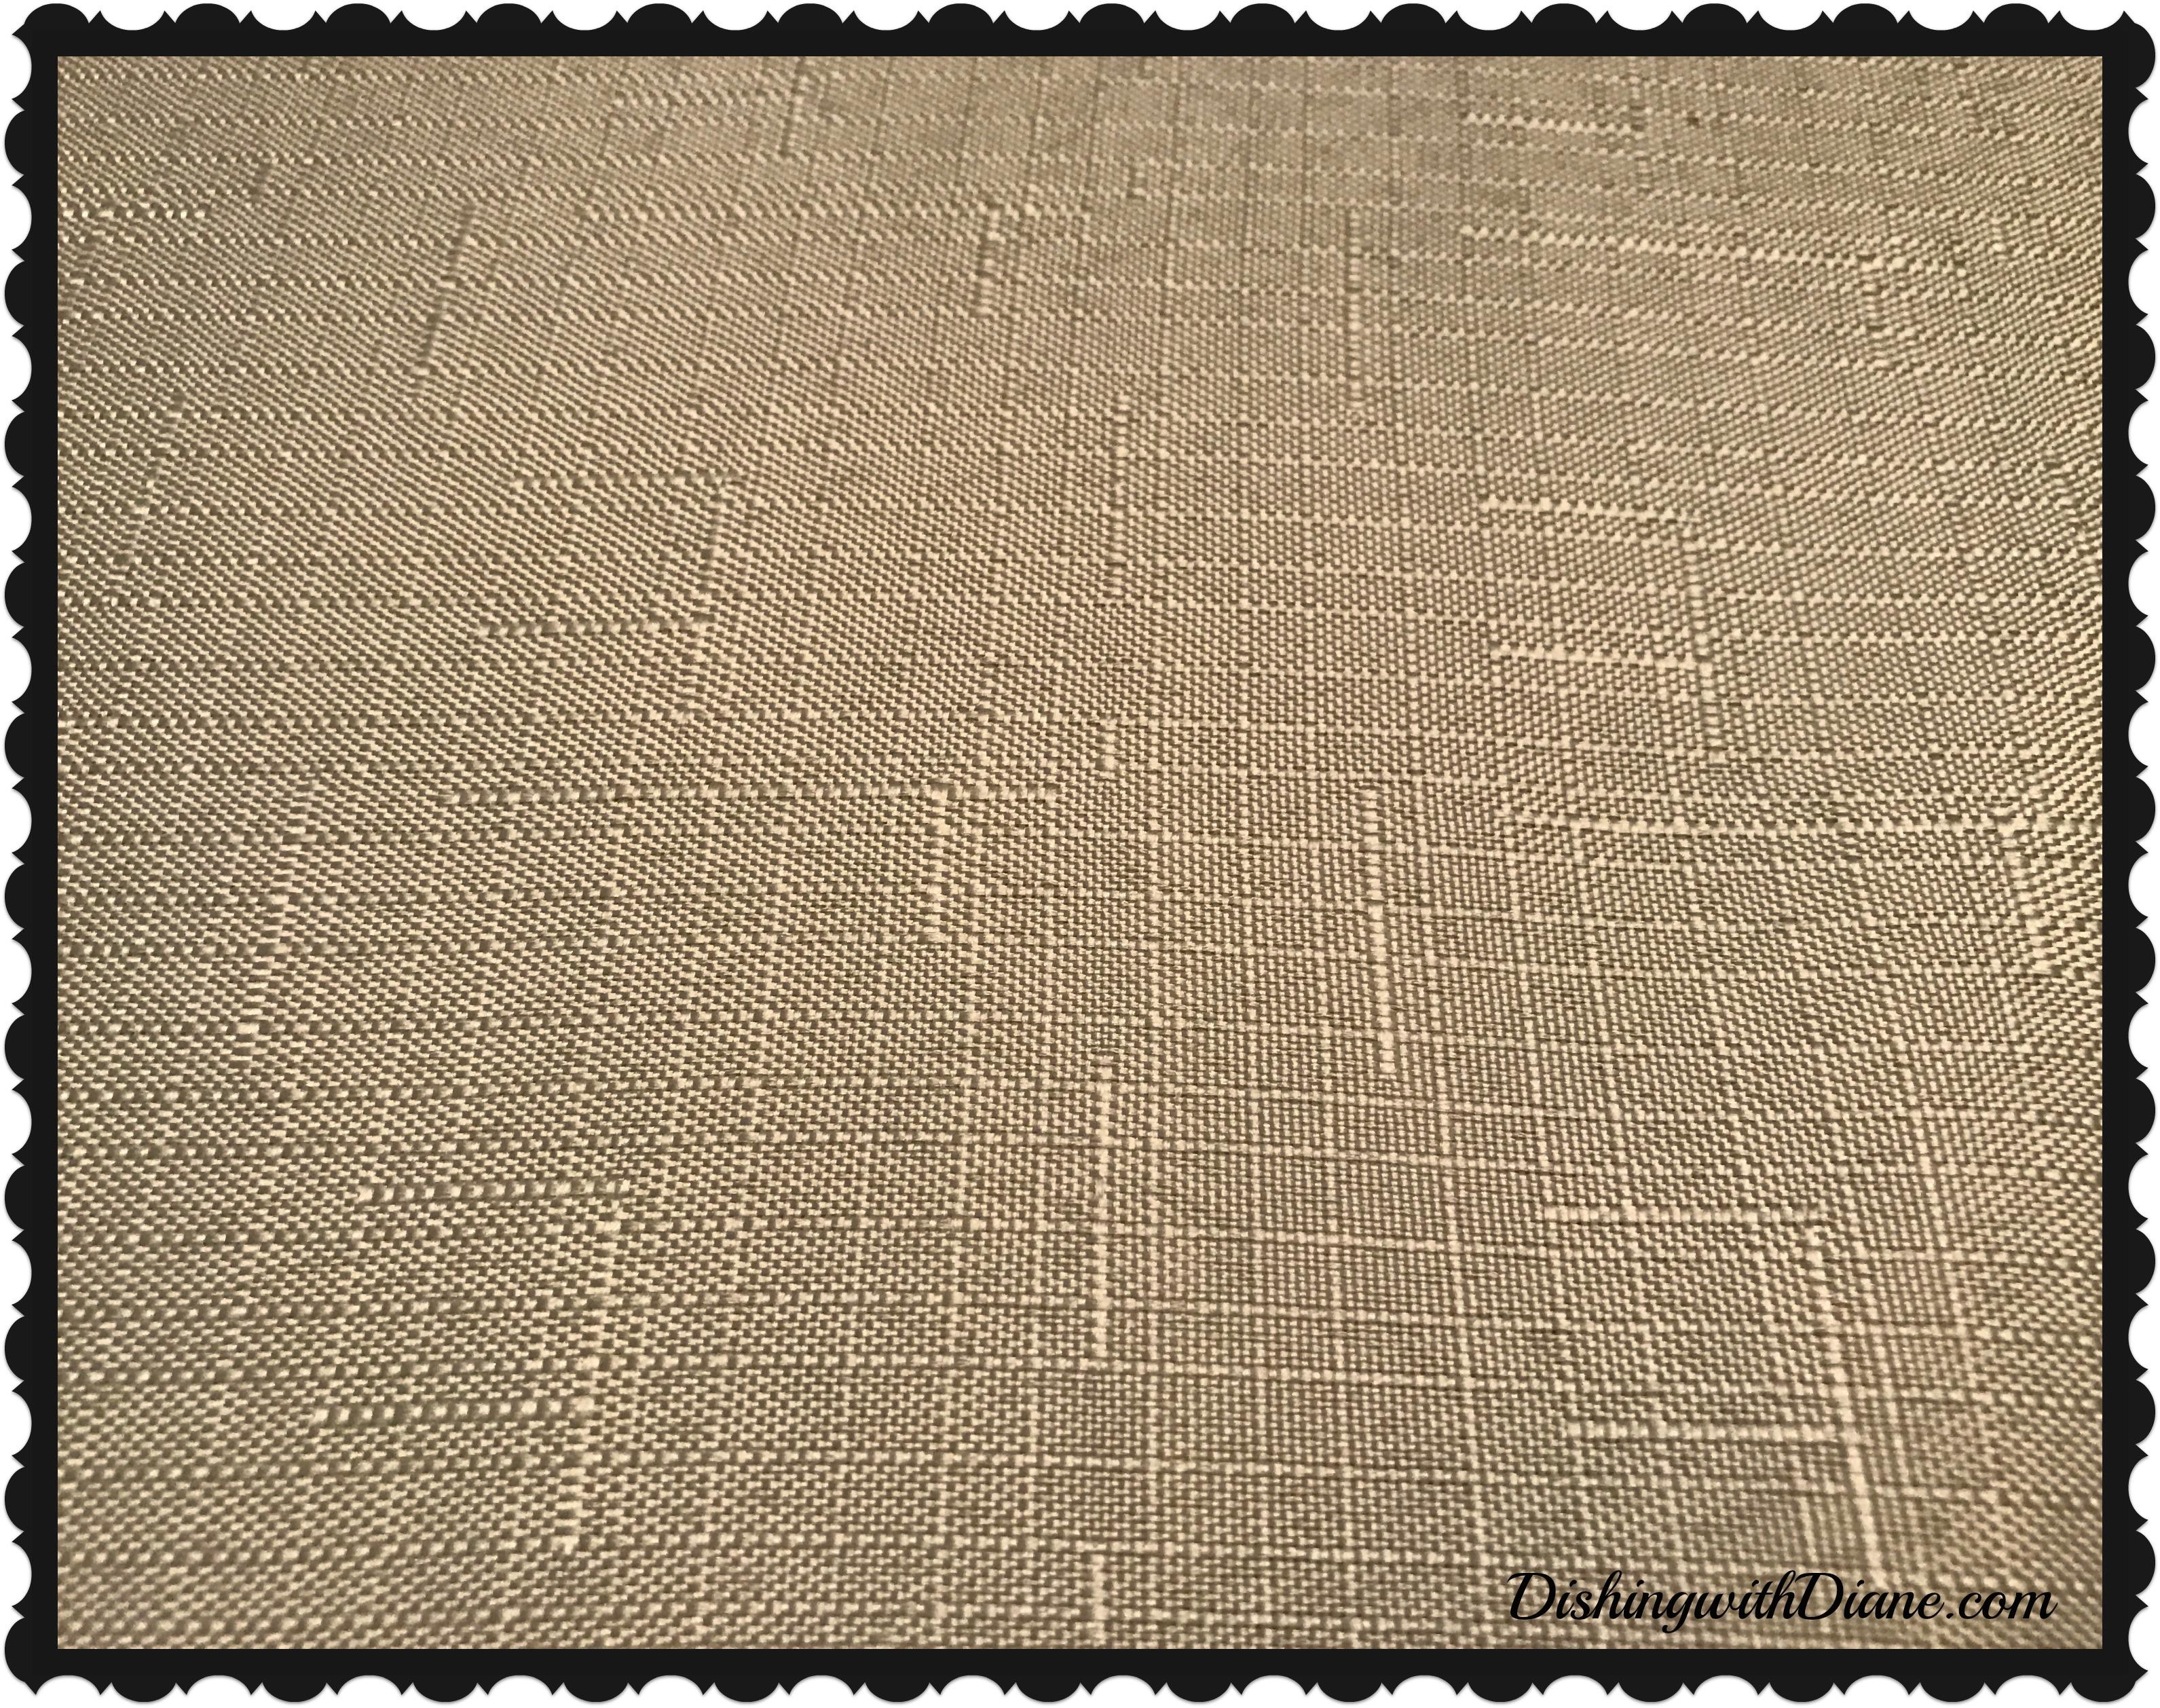 photo-jan-24-2-59-58-tablecloth